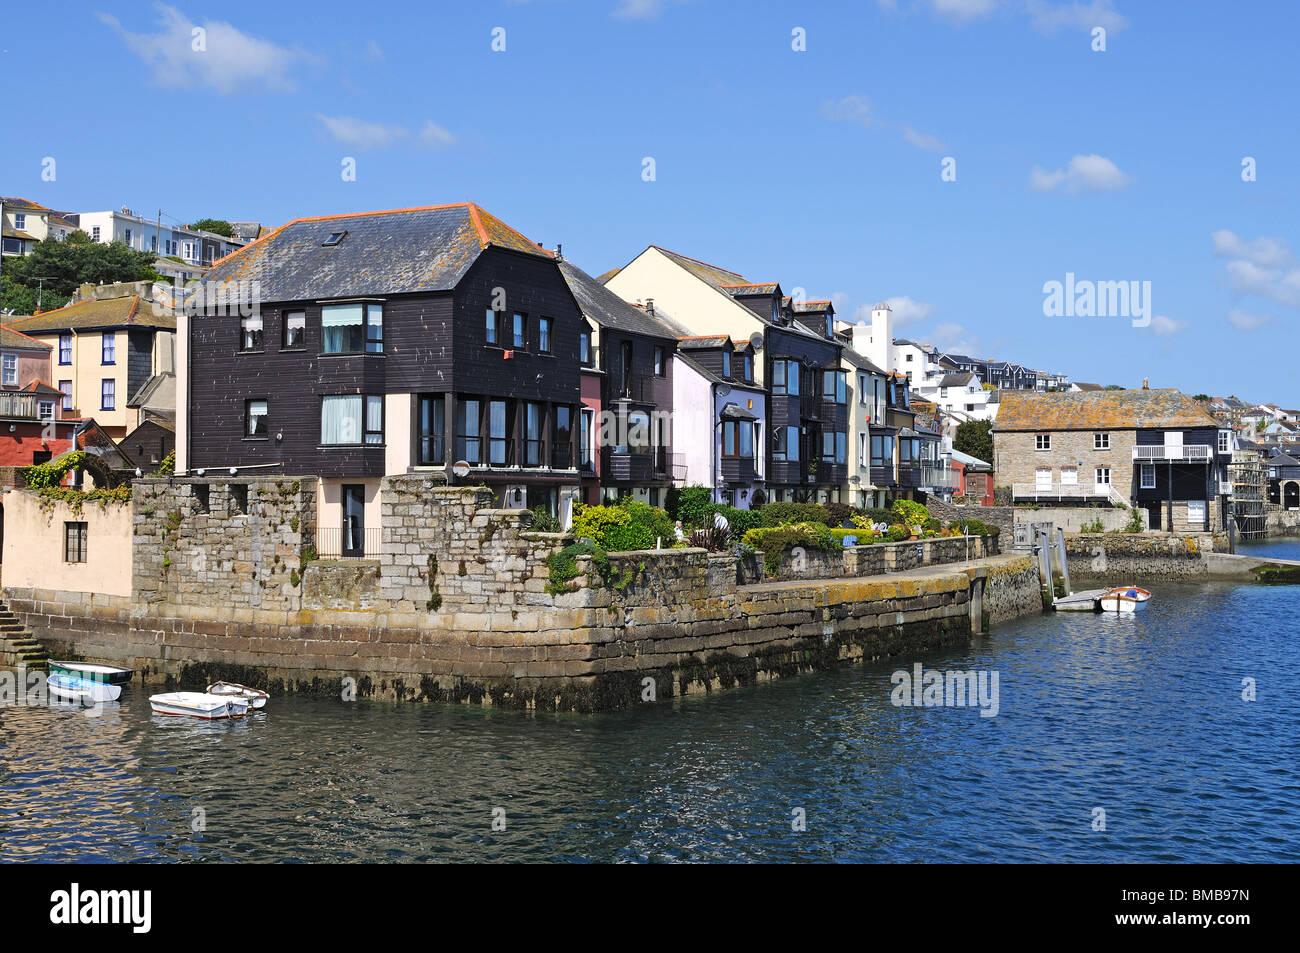 Waterside Village Apartments